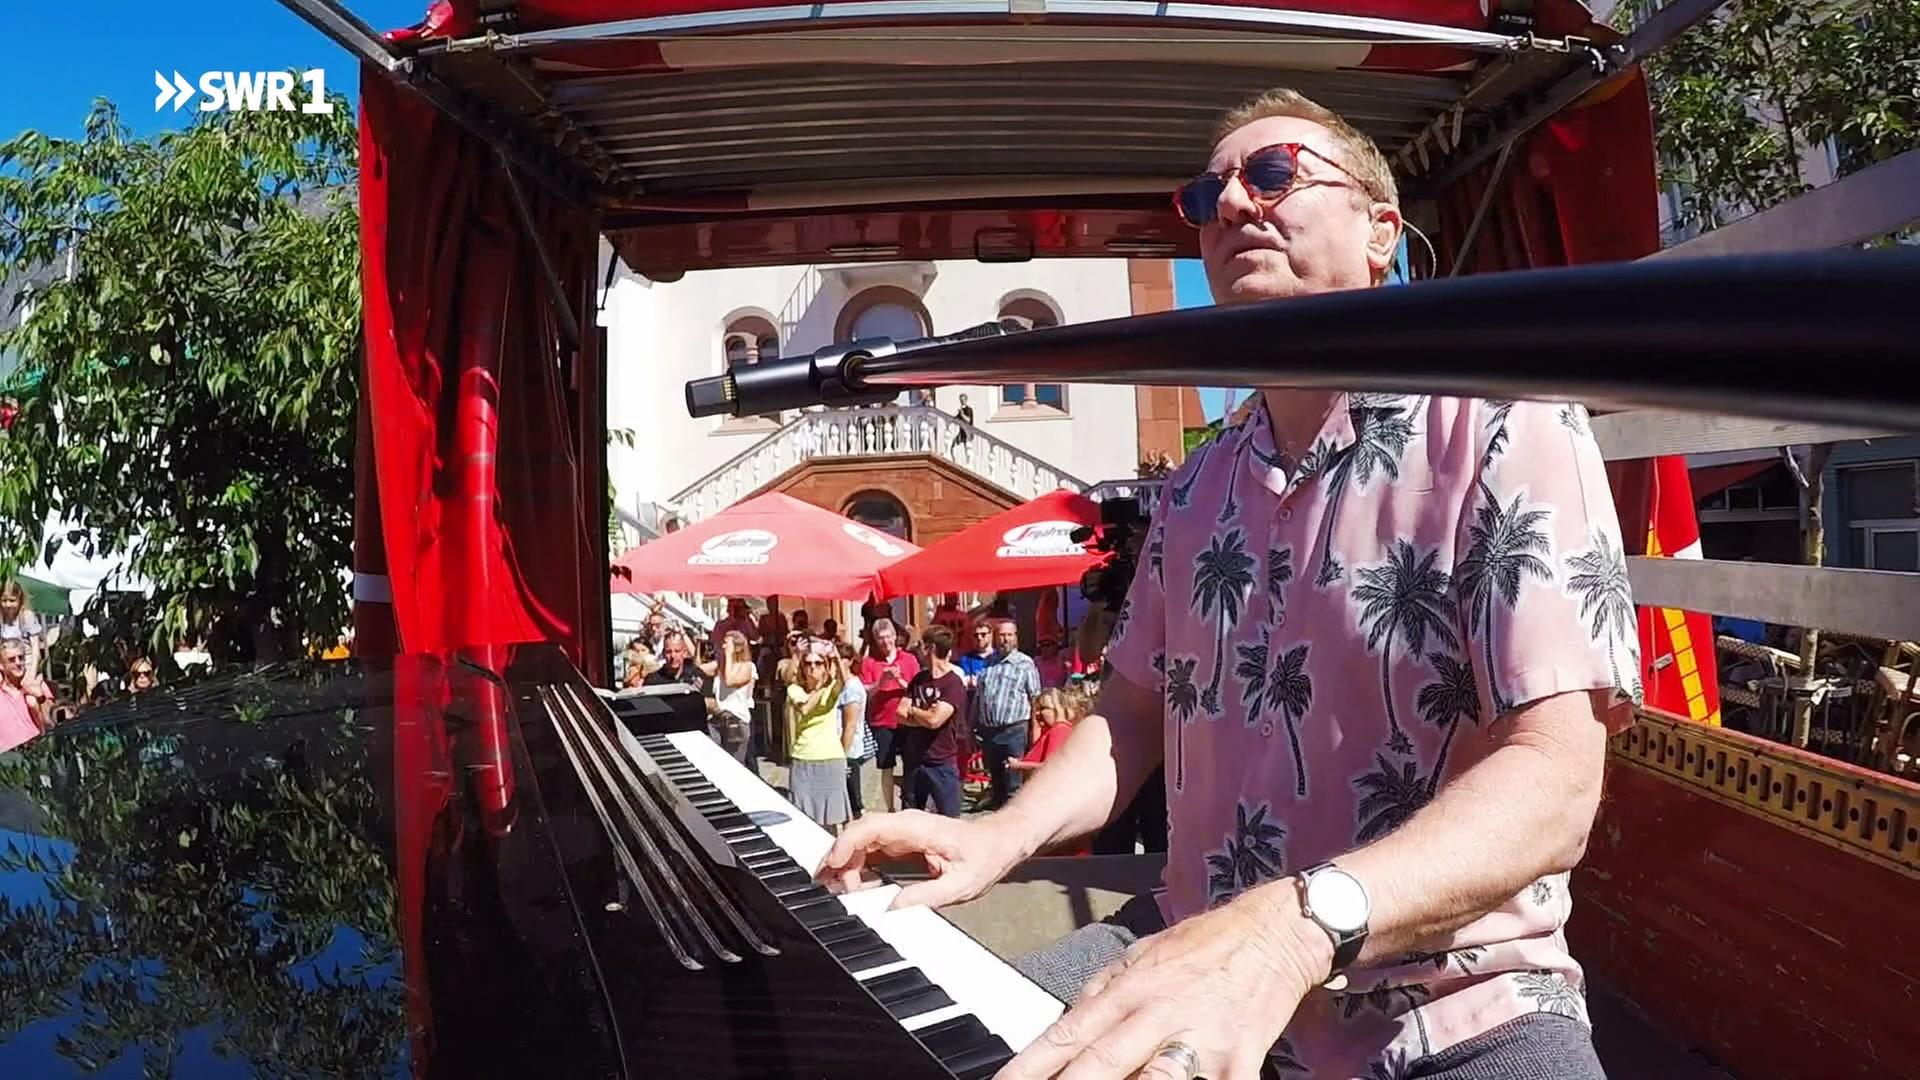 SWR1 Flashmob mit John Miles -